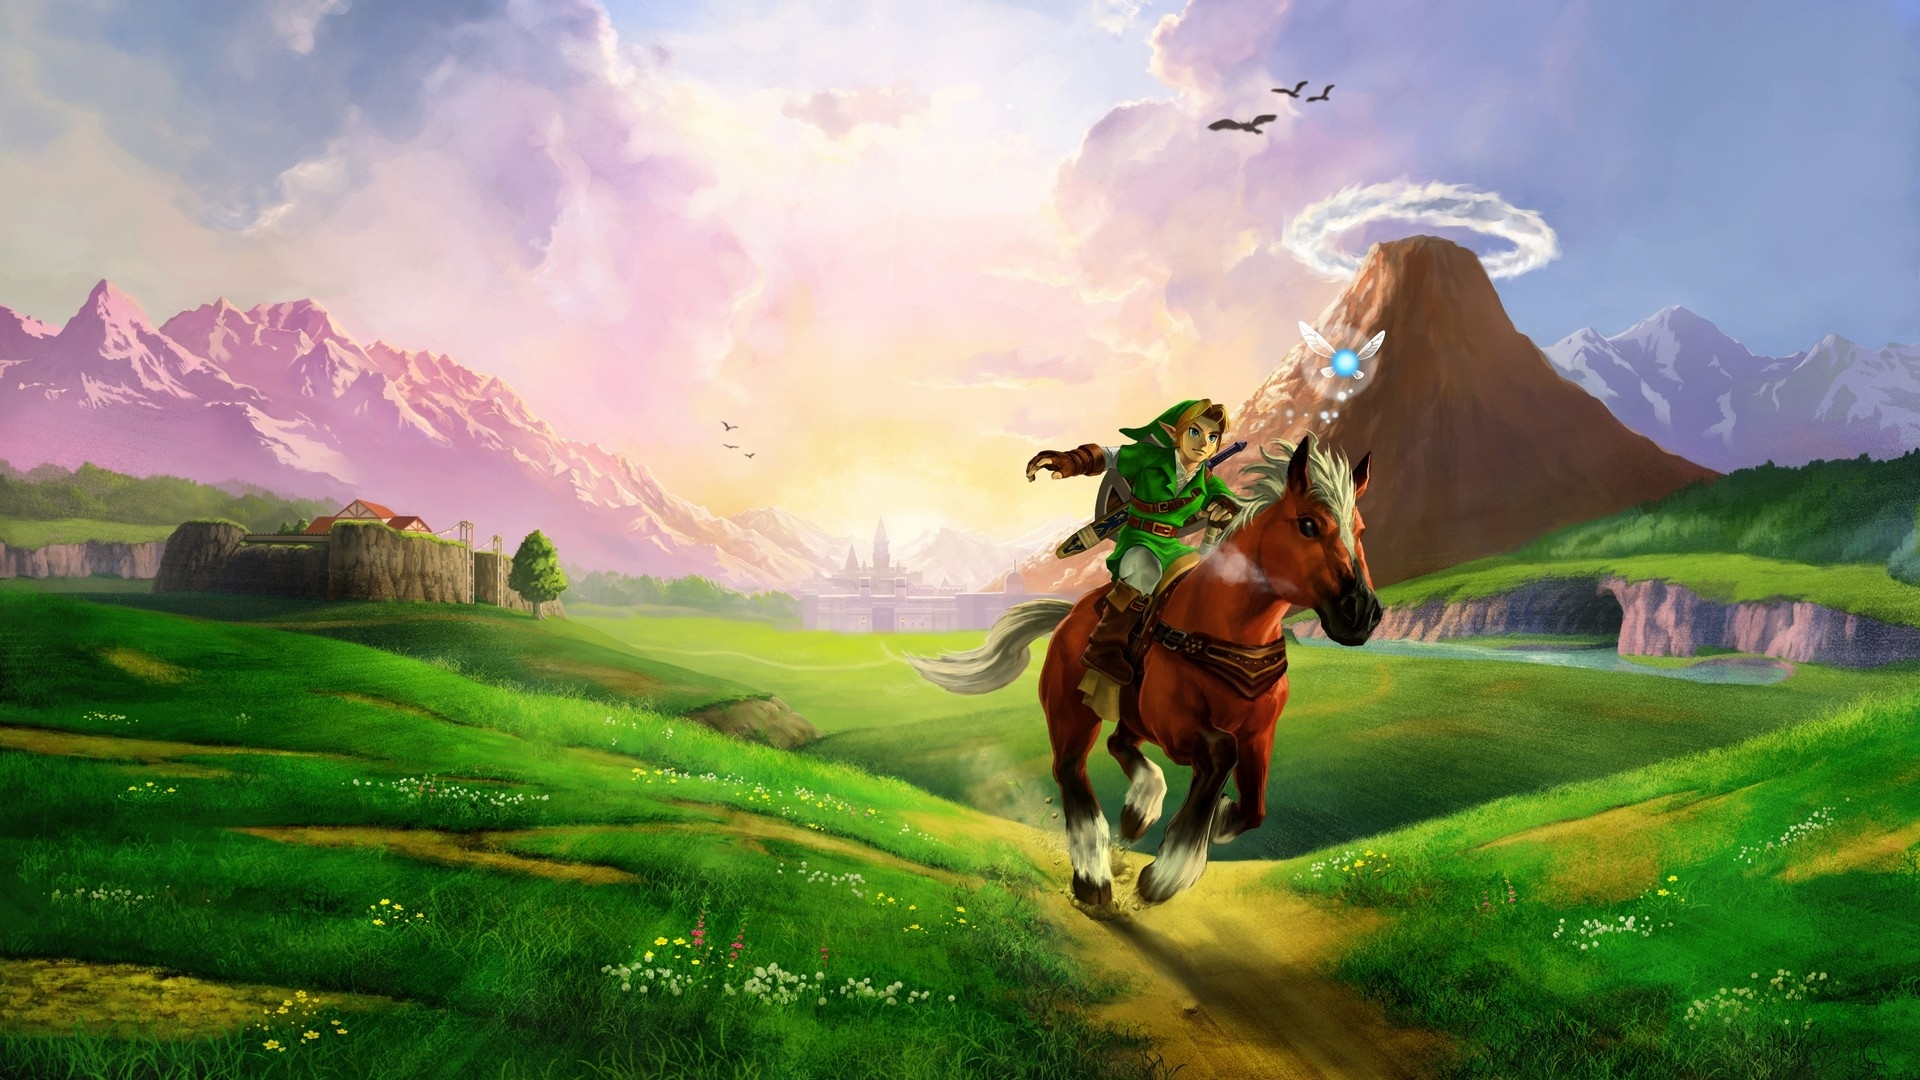 legend of zelda Horse Plain River Sunlight Zelda Full HD 1080p HD 1920x1080